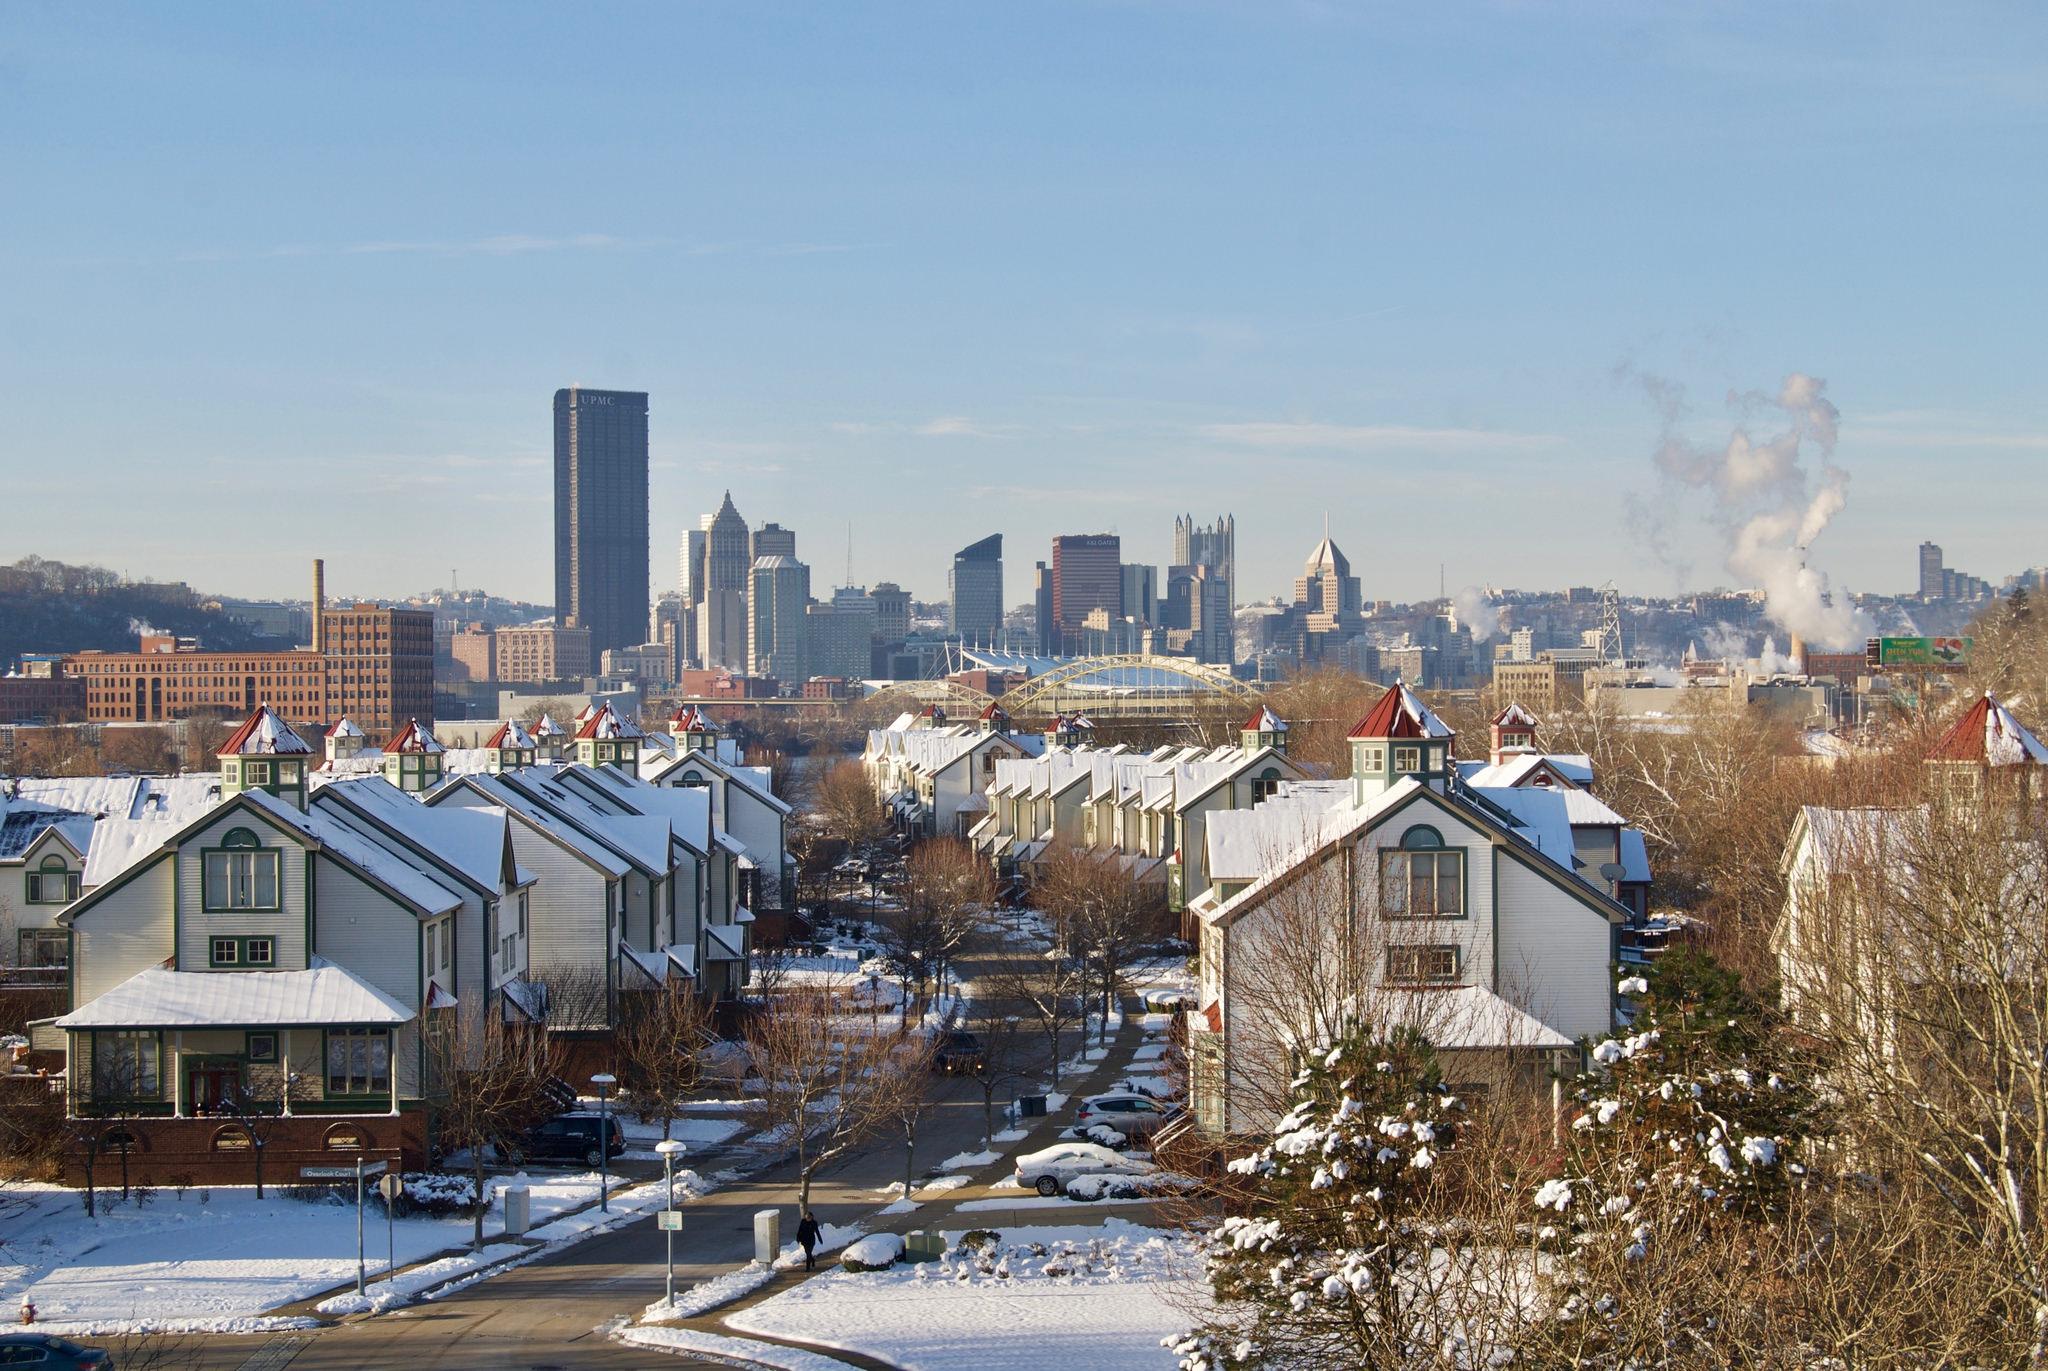 Farmer's Almanac Predicts Mild Winter 2017-2018 For Pittsburgh